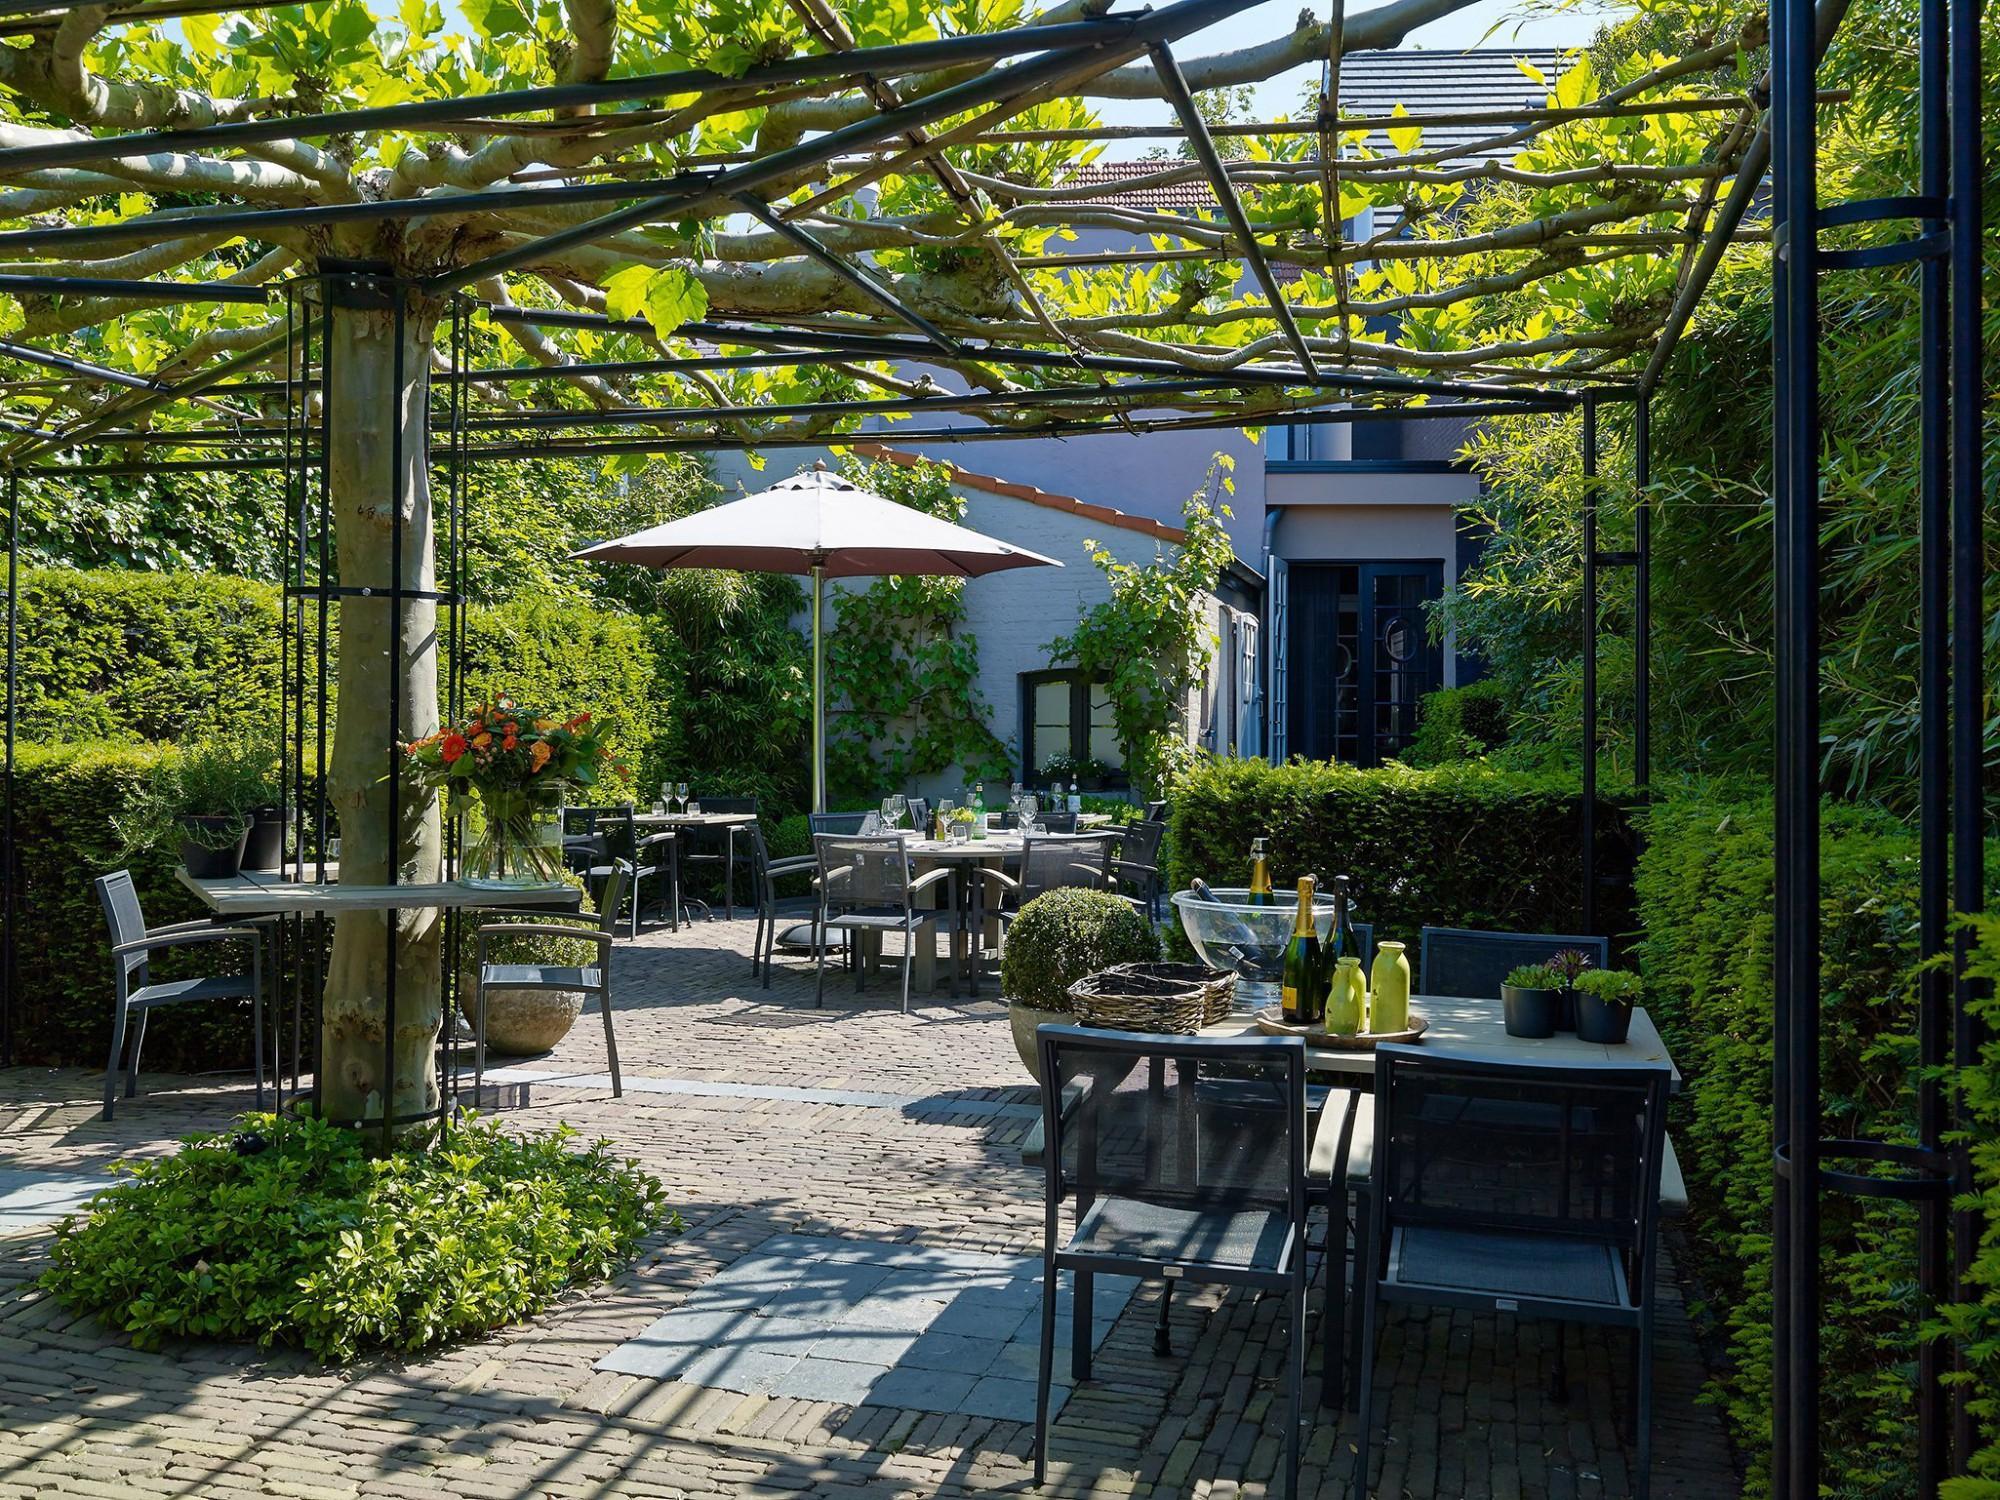 Afbeelding: Fotografie binnentuin Eglantierke Hoogstraten.